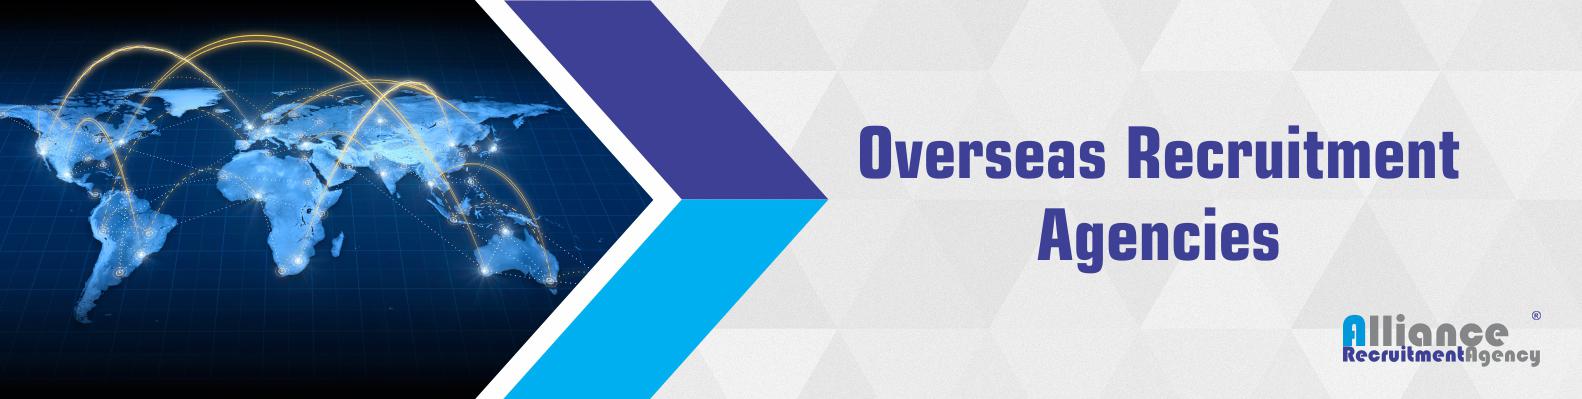 Overseas Recruitment Agencies - Overseas Recruitment Agencies In India